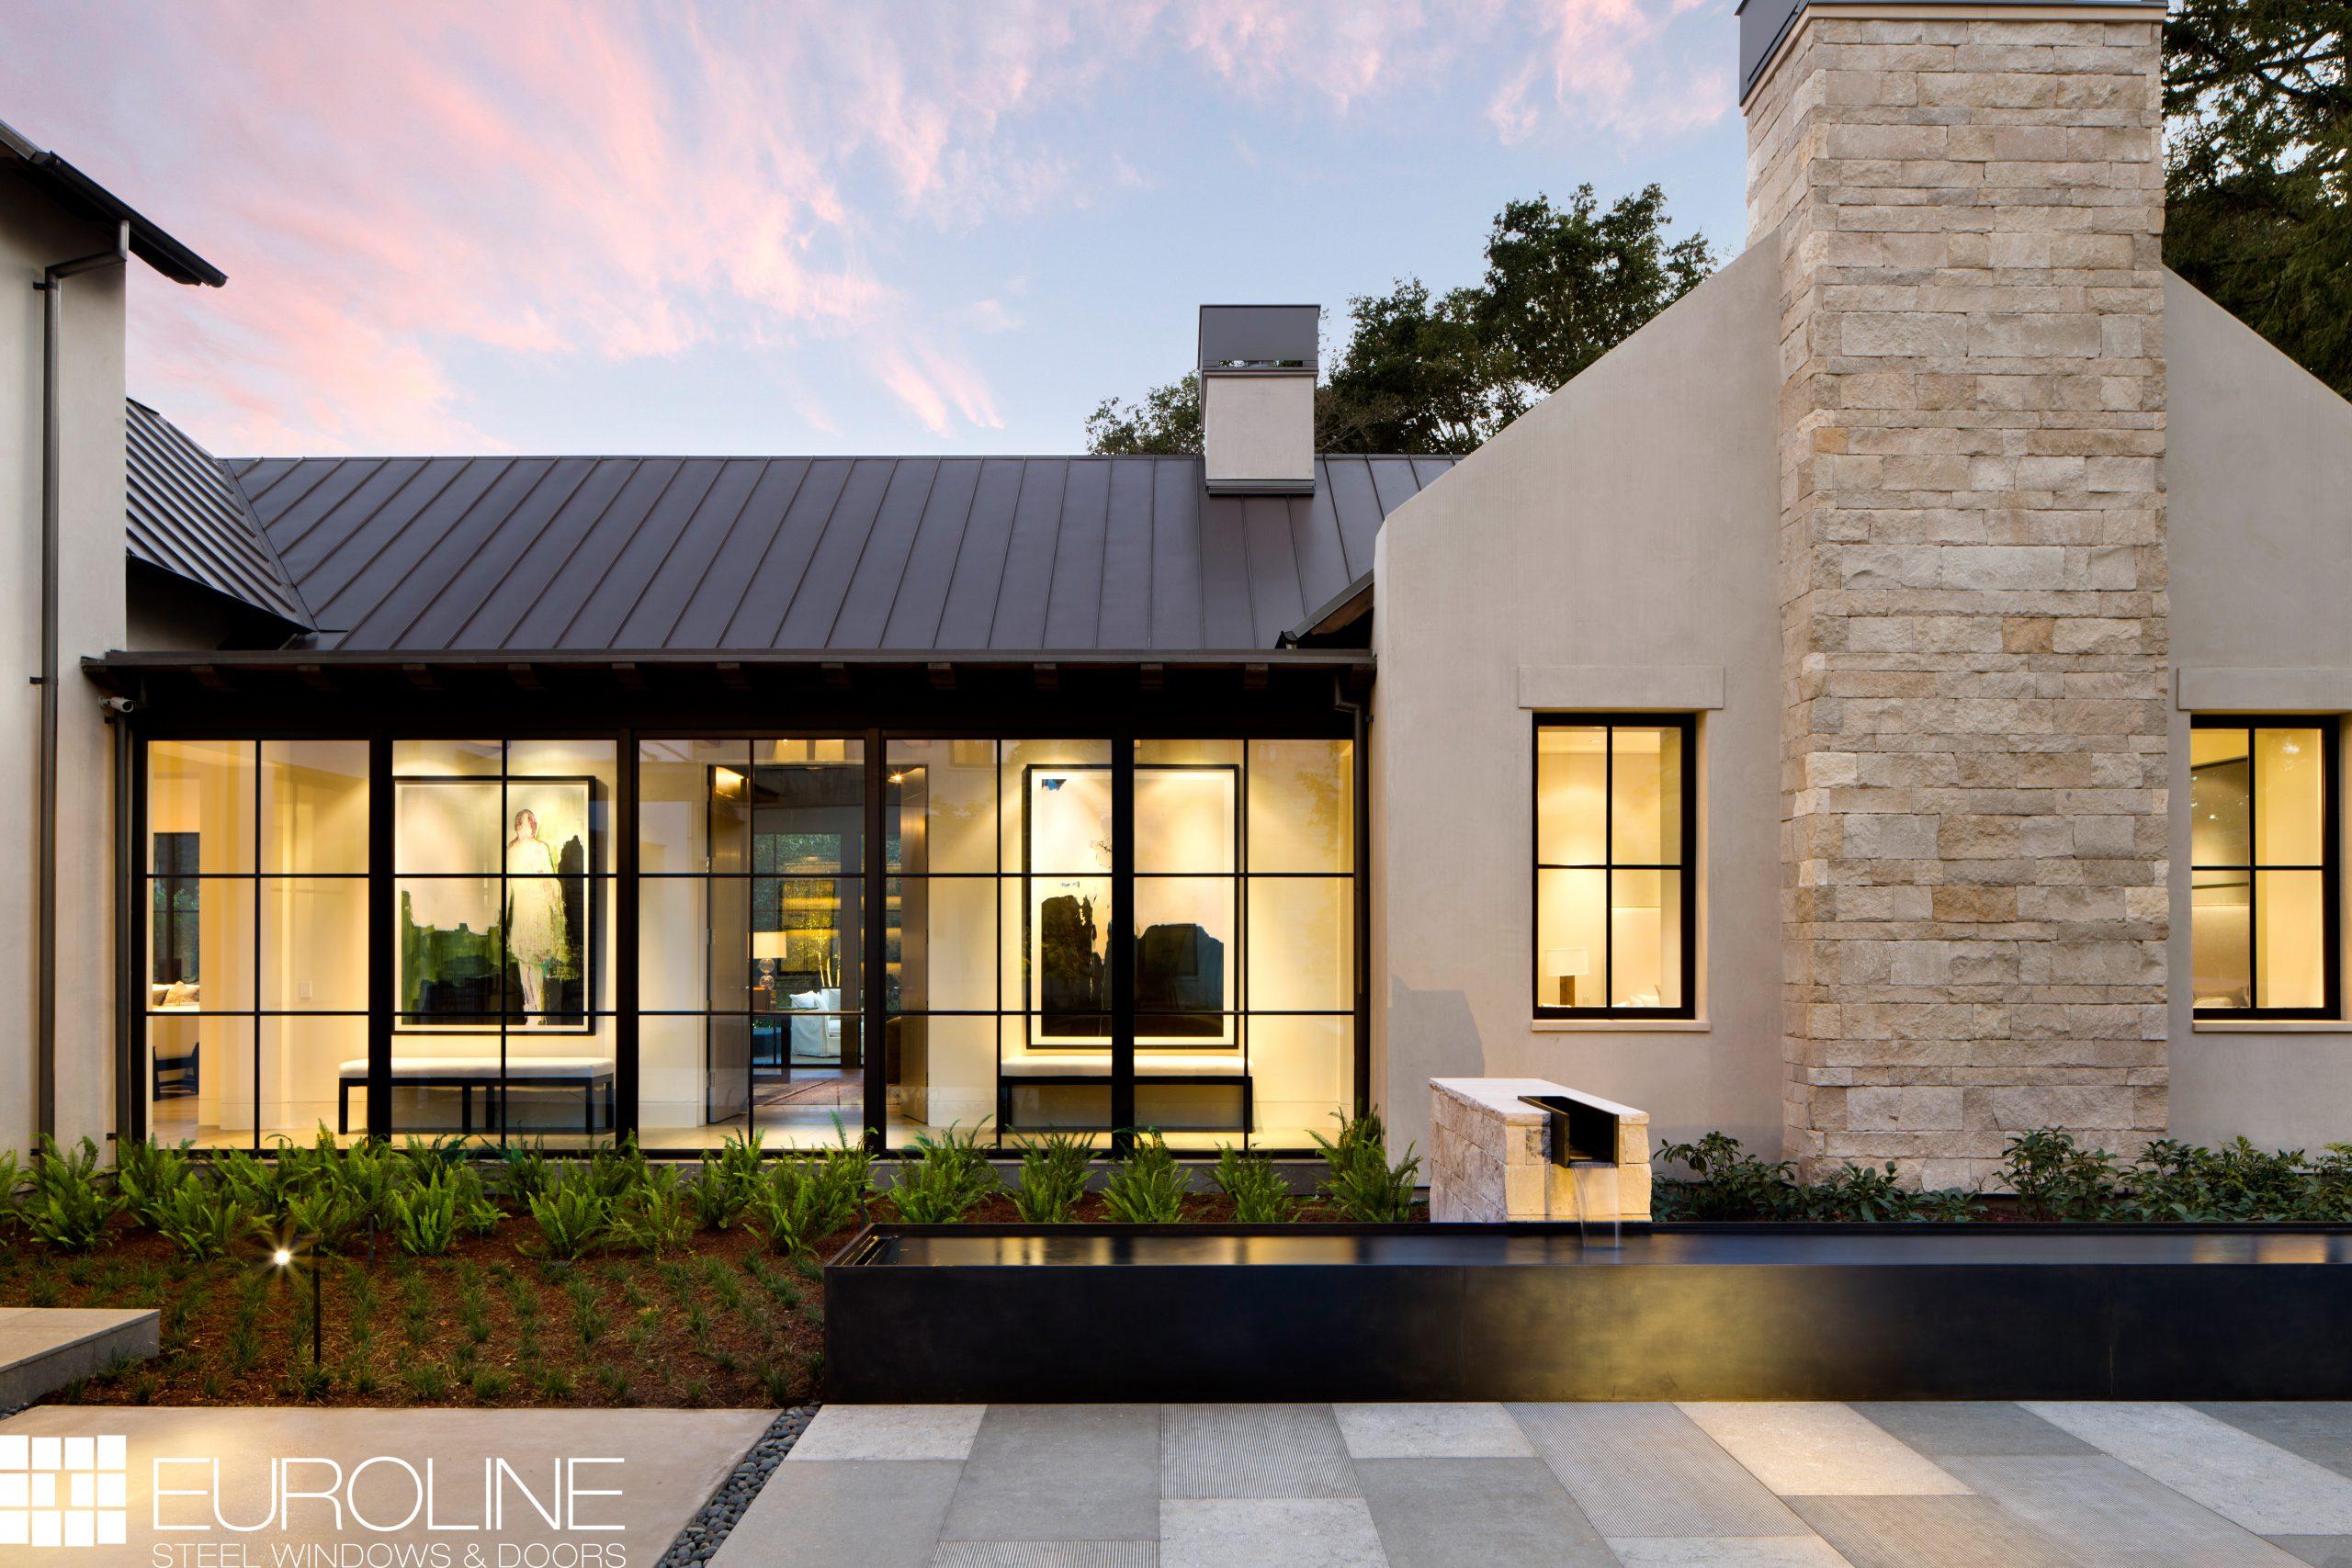 Modern home with EuroLine windows